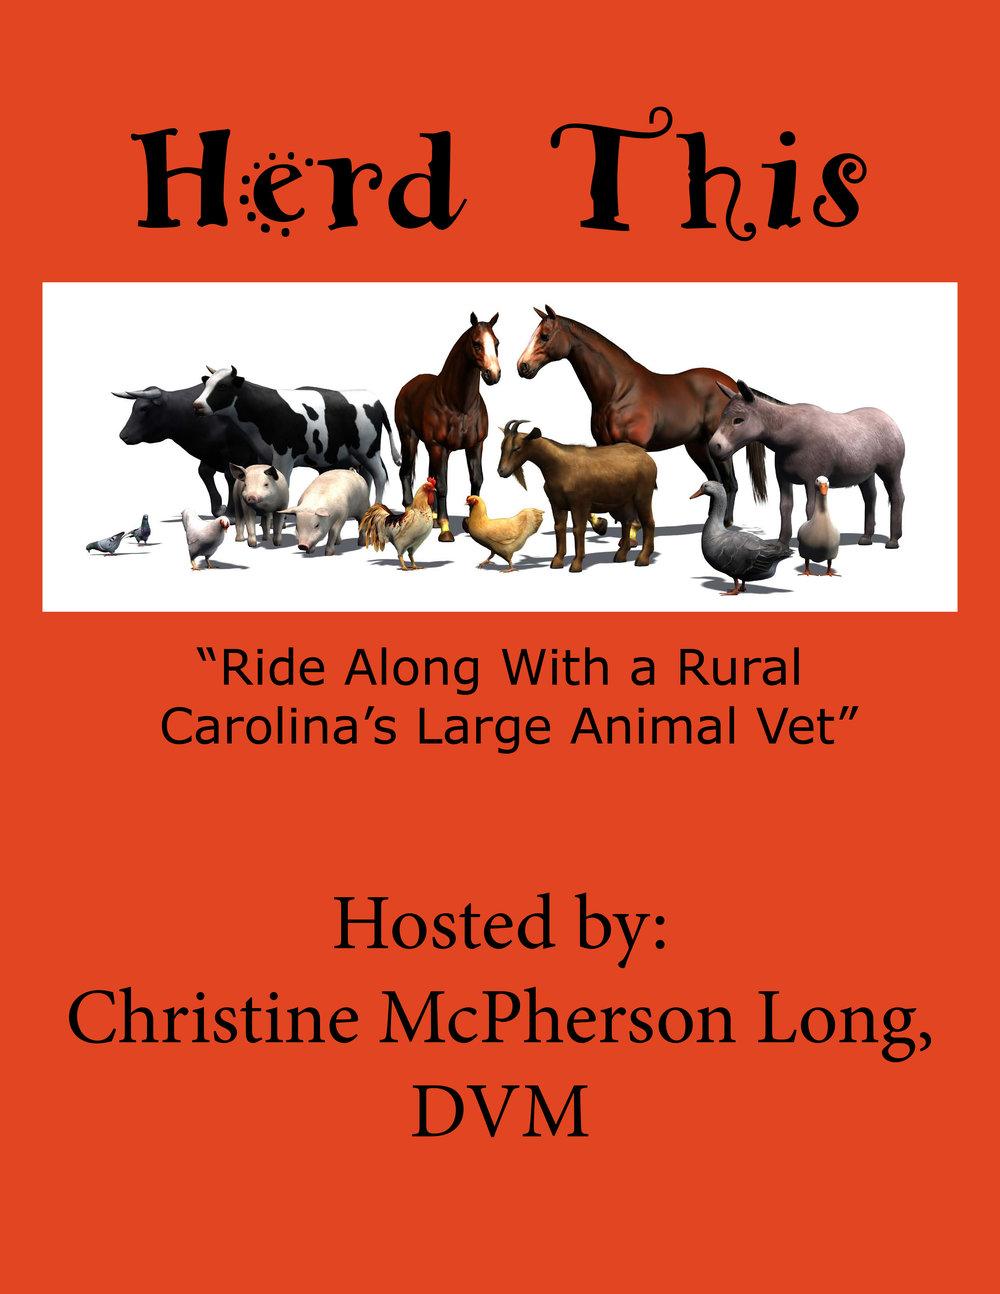 Herd This logo.jpg